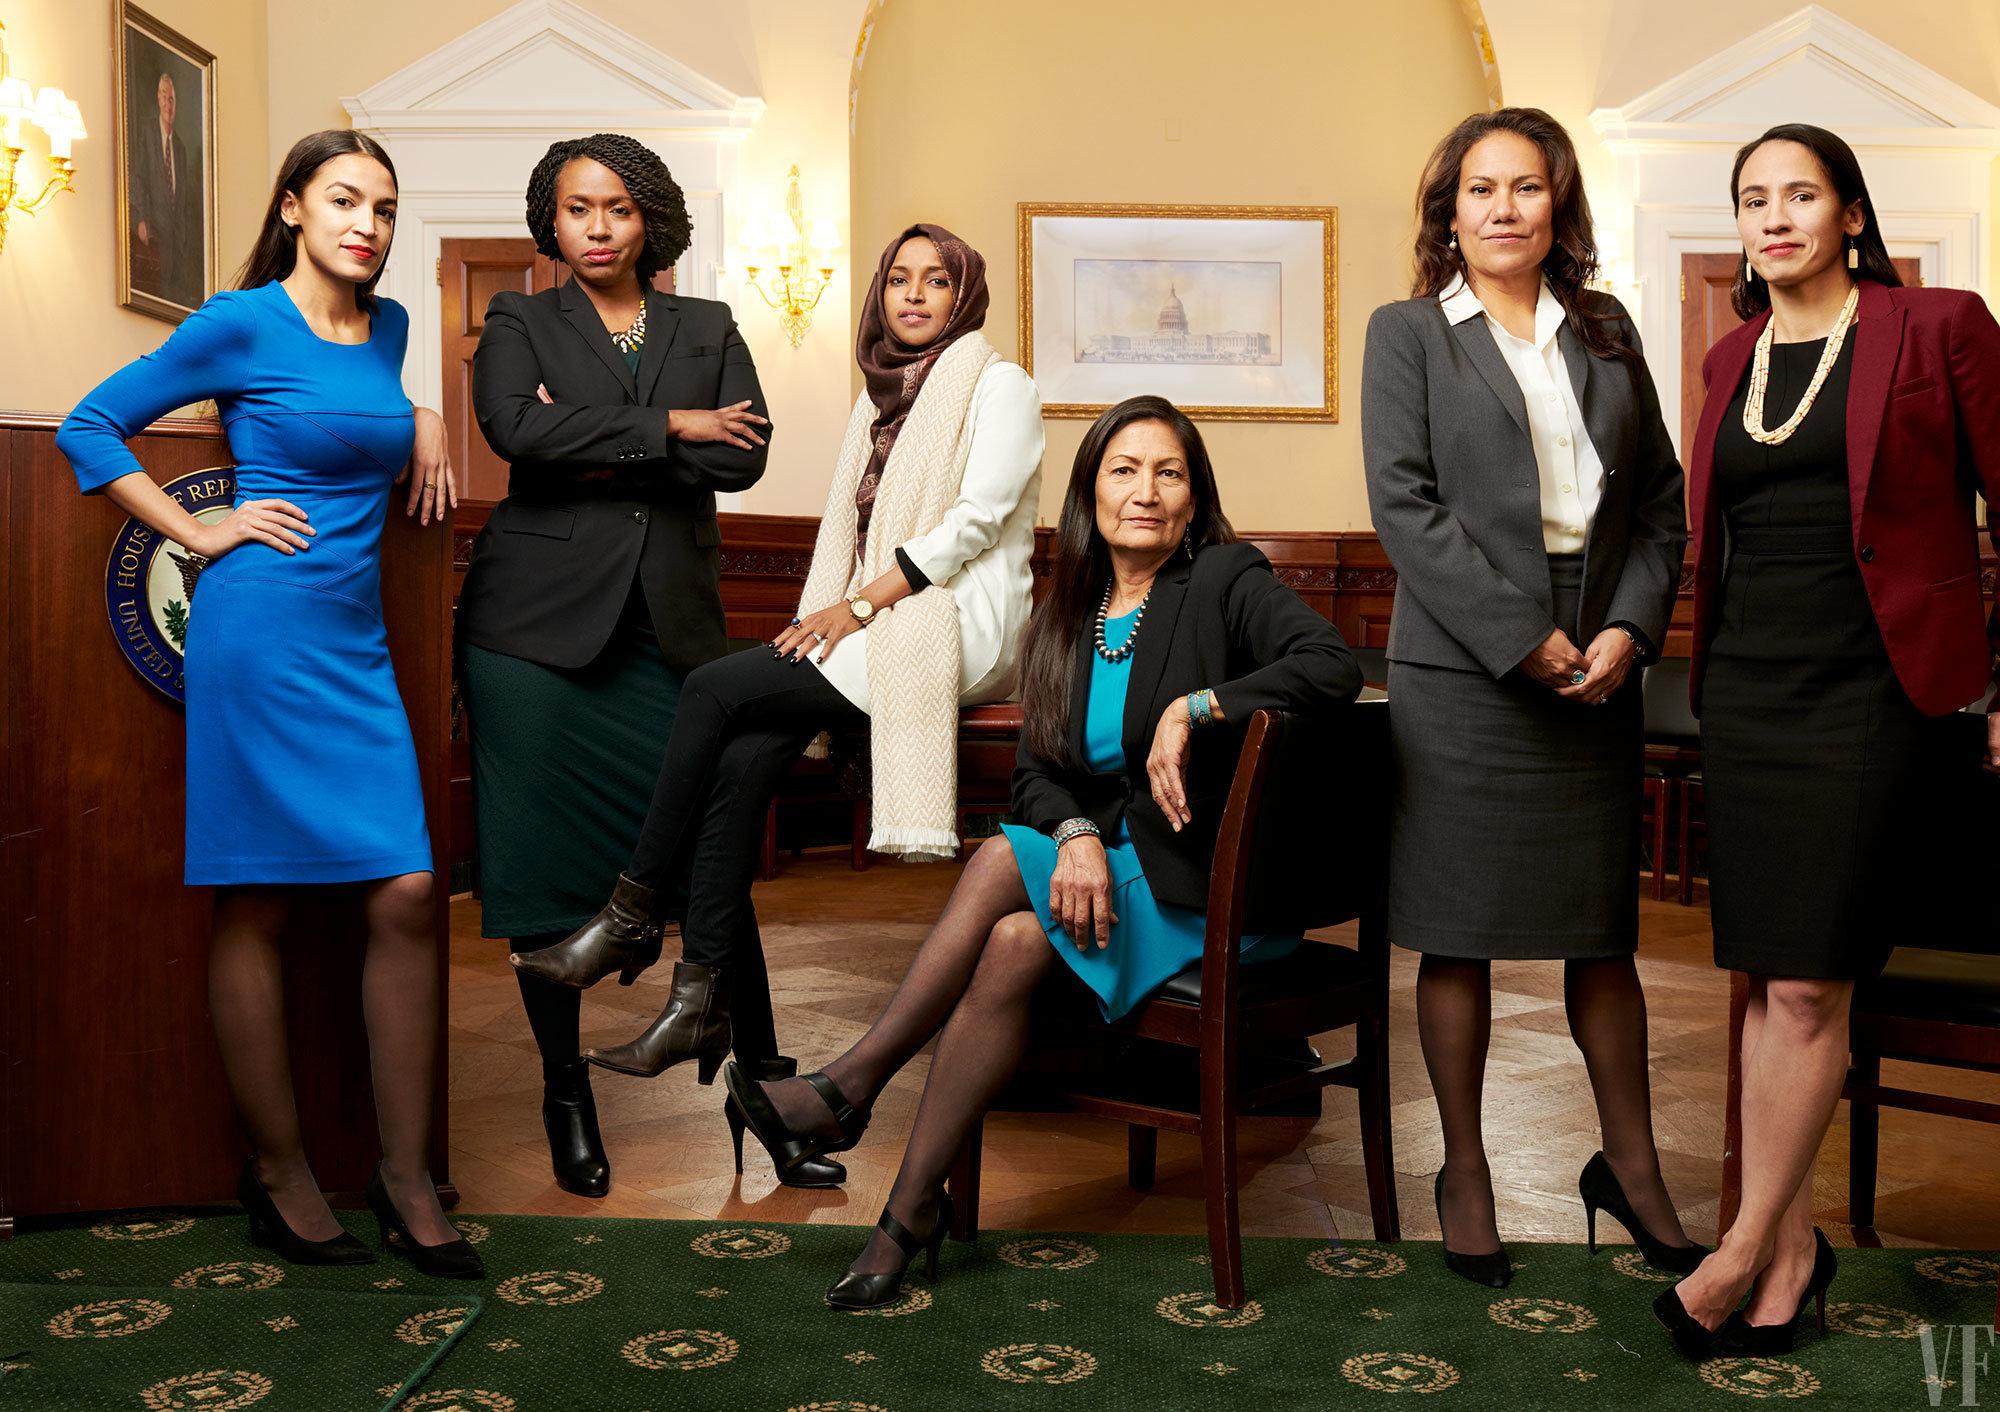 alexandria-ocasio-cortez-reveals-badass-portrait-of-a-new-wave-of-congresswomen